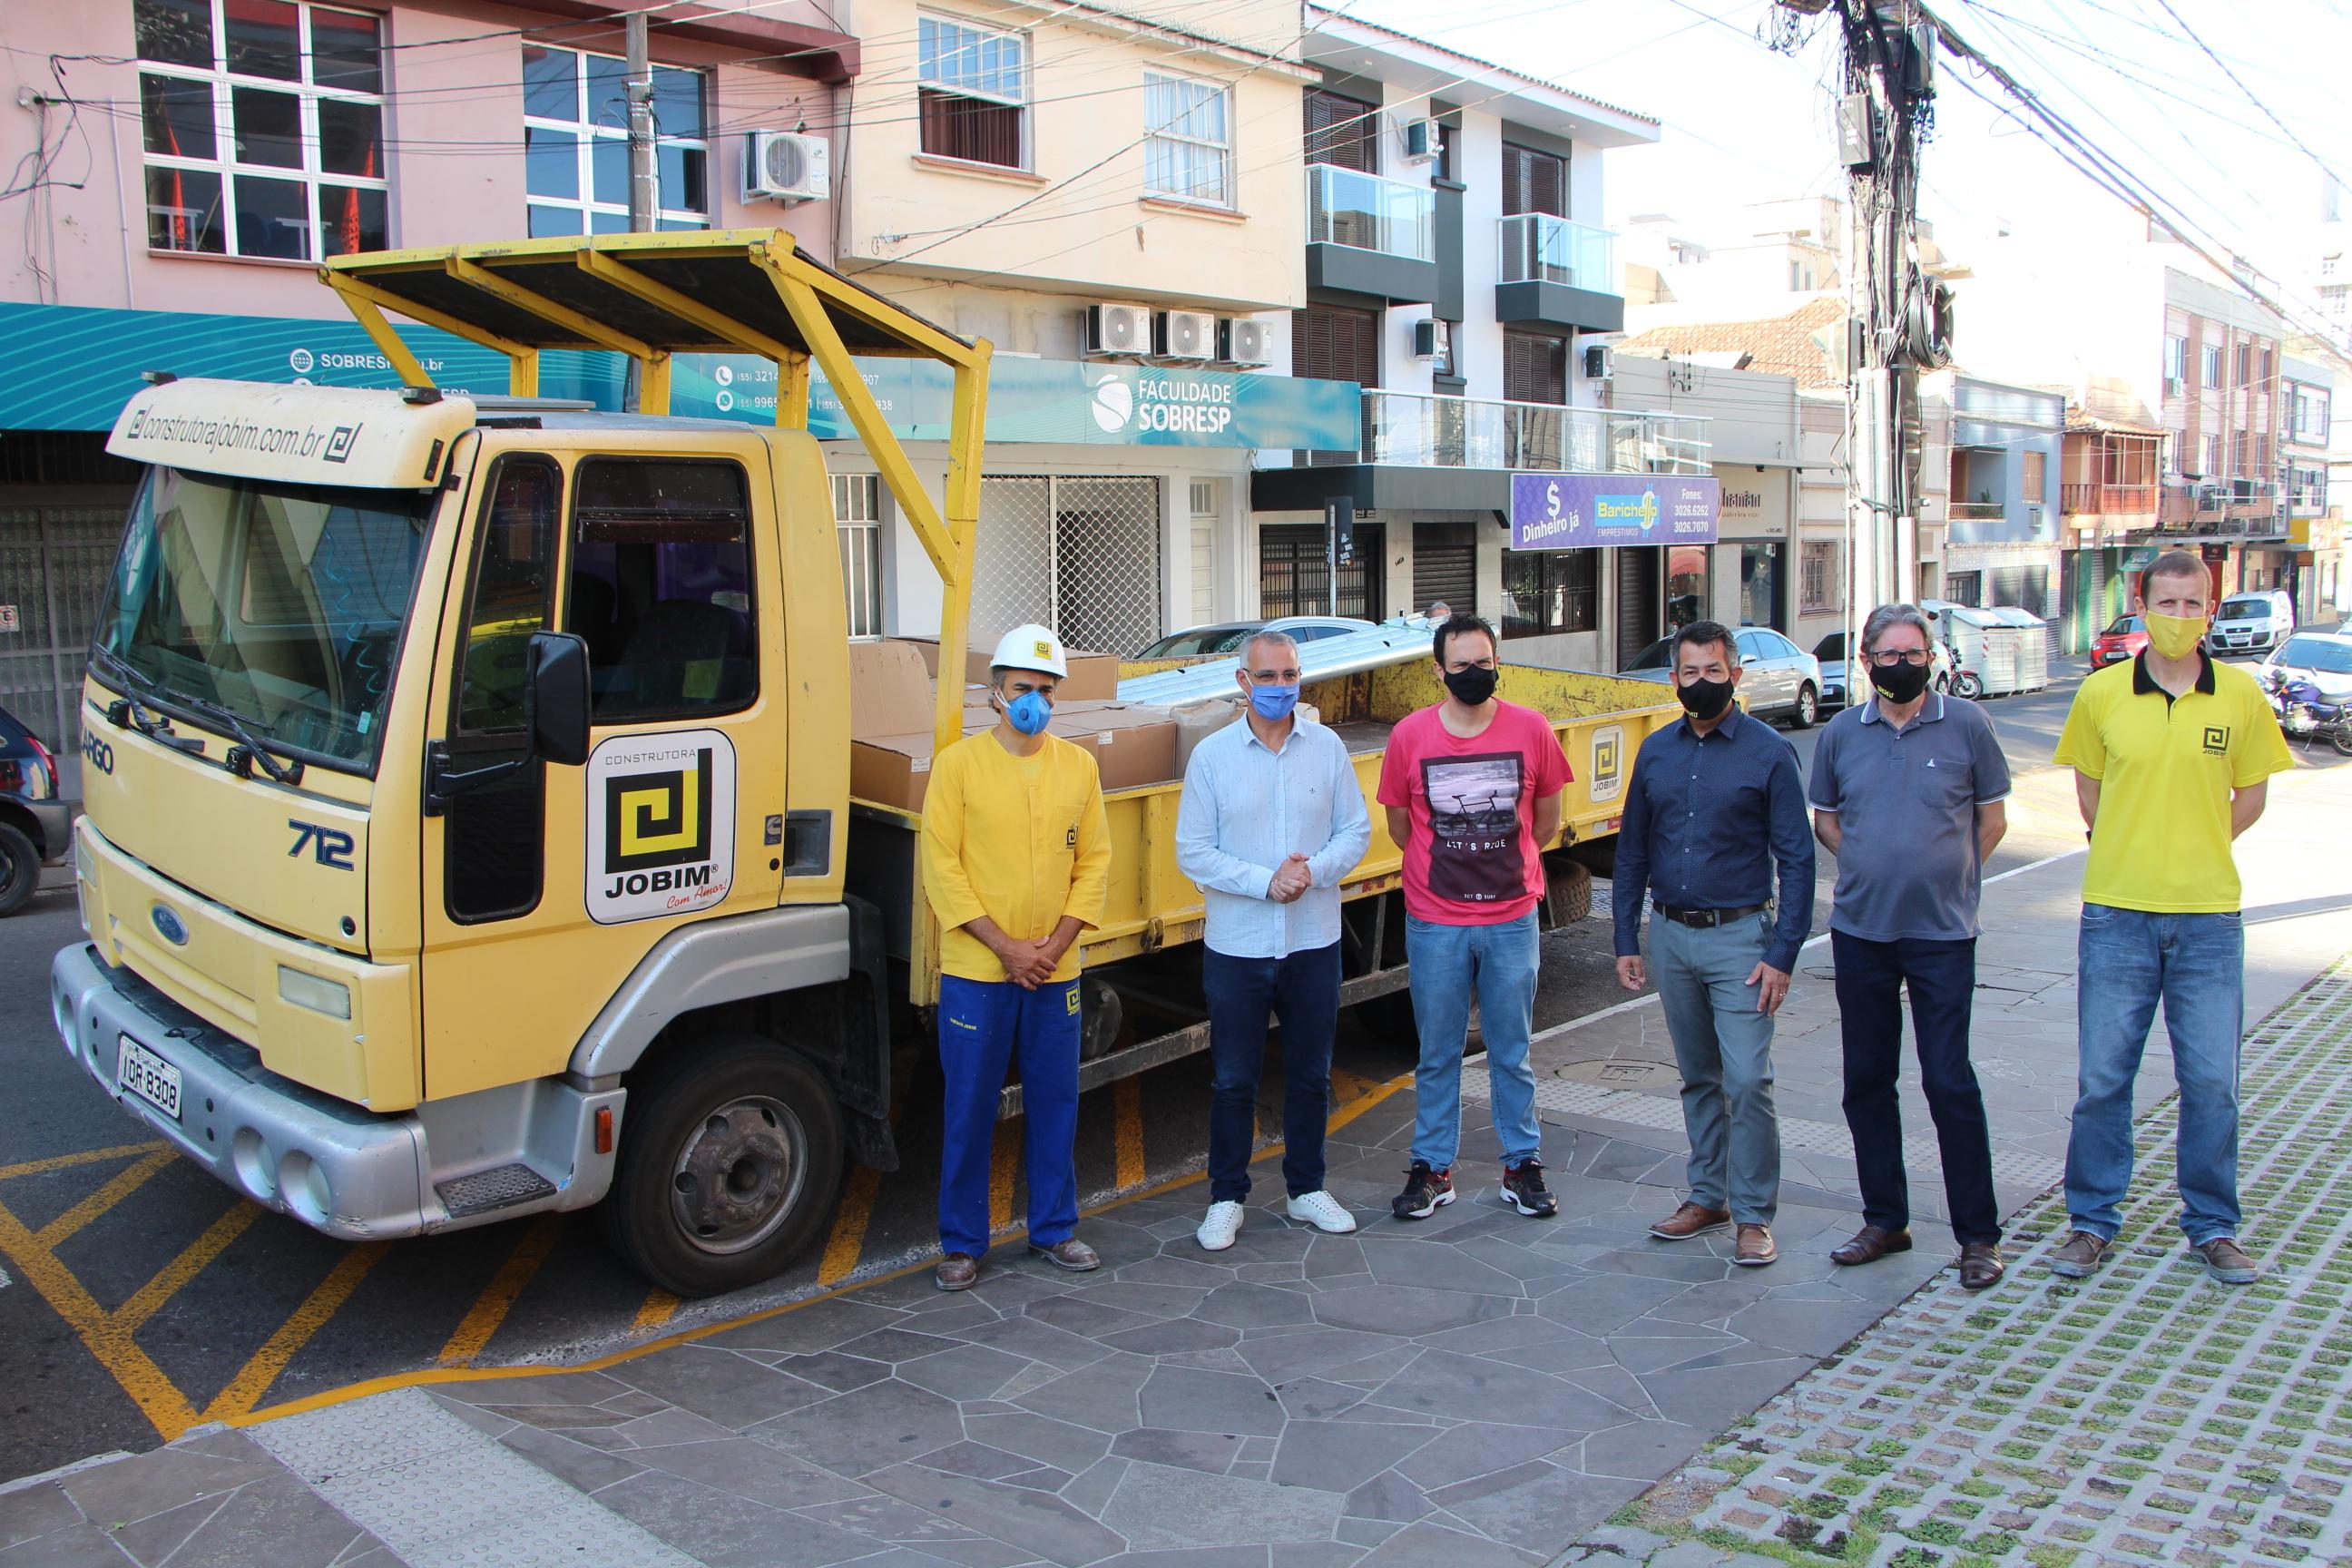 Entrega de materiais para a Prefeitura de Santa Maria é feita para viabilizar o fluxo de trânsito no empreendimento Espírito Santo